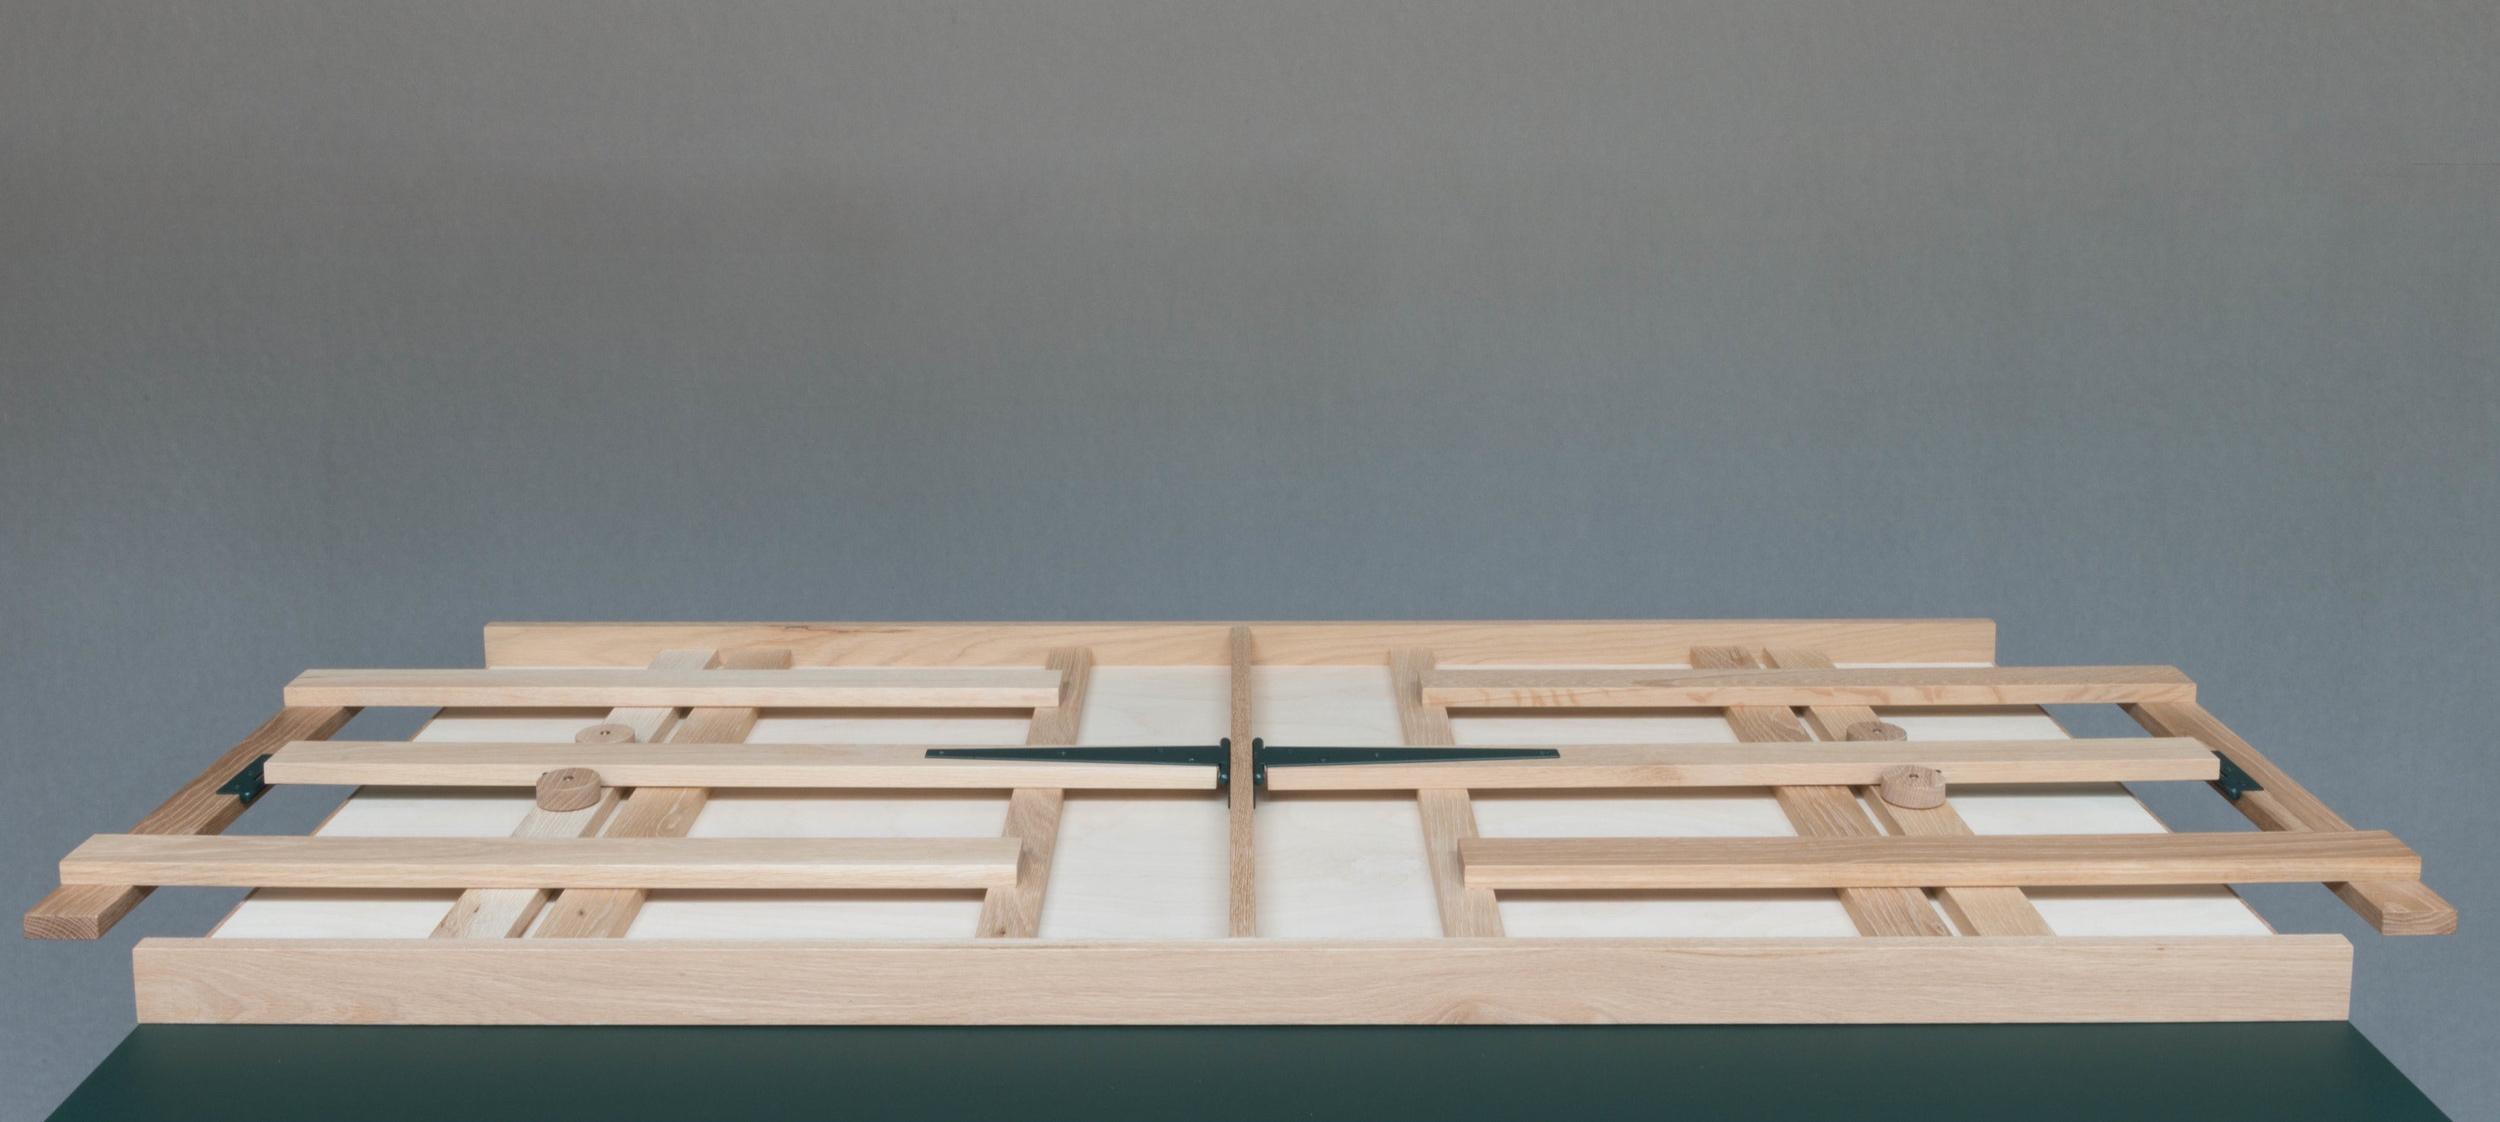 EF+folding+tables-5737.jpg